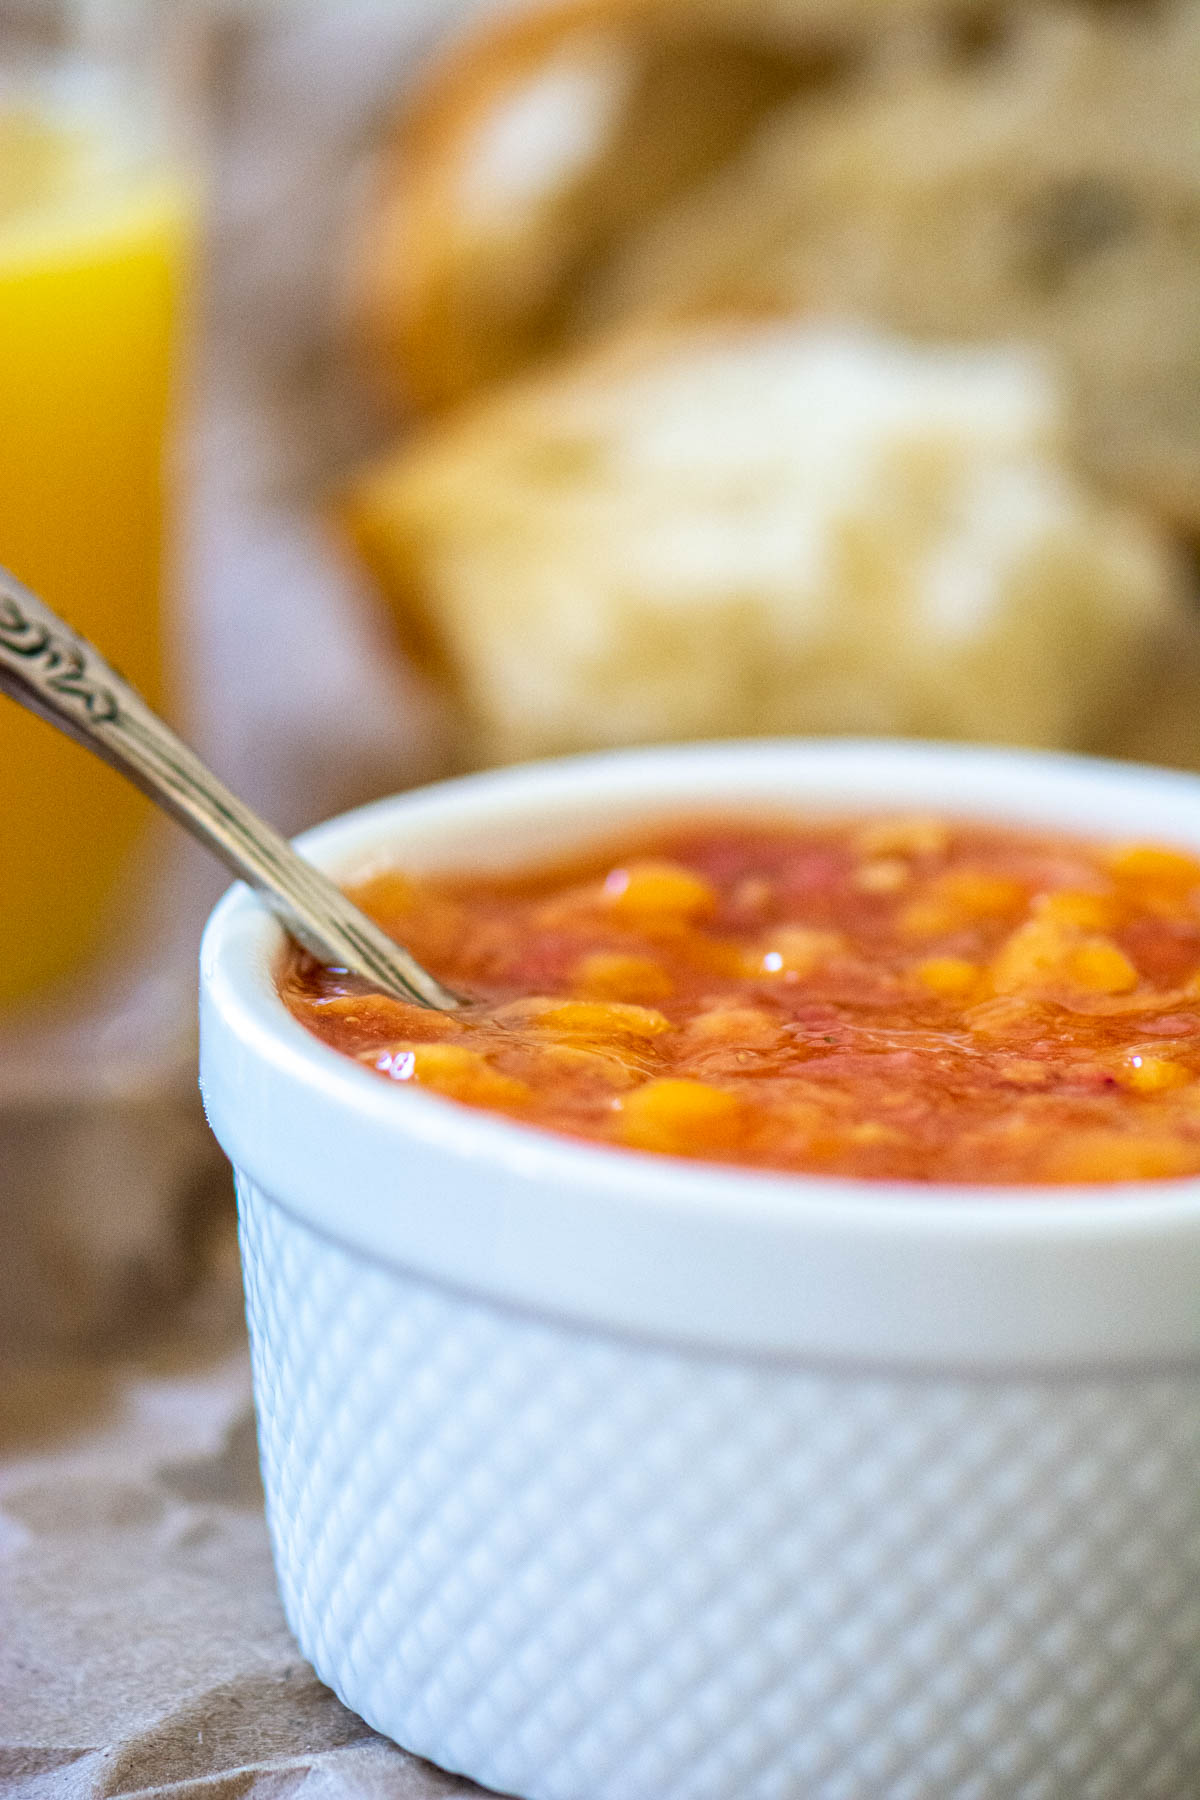 closeup of the freezer strawberry mango jam in a white dish.